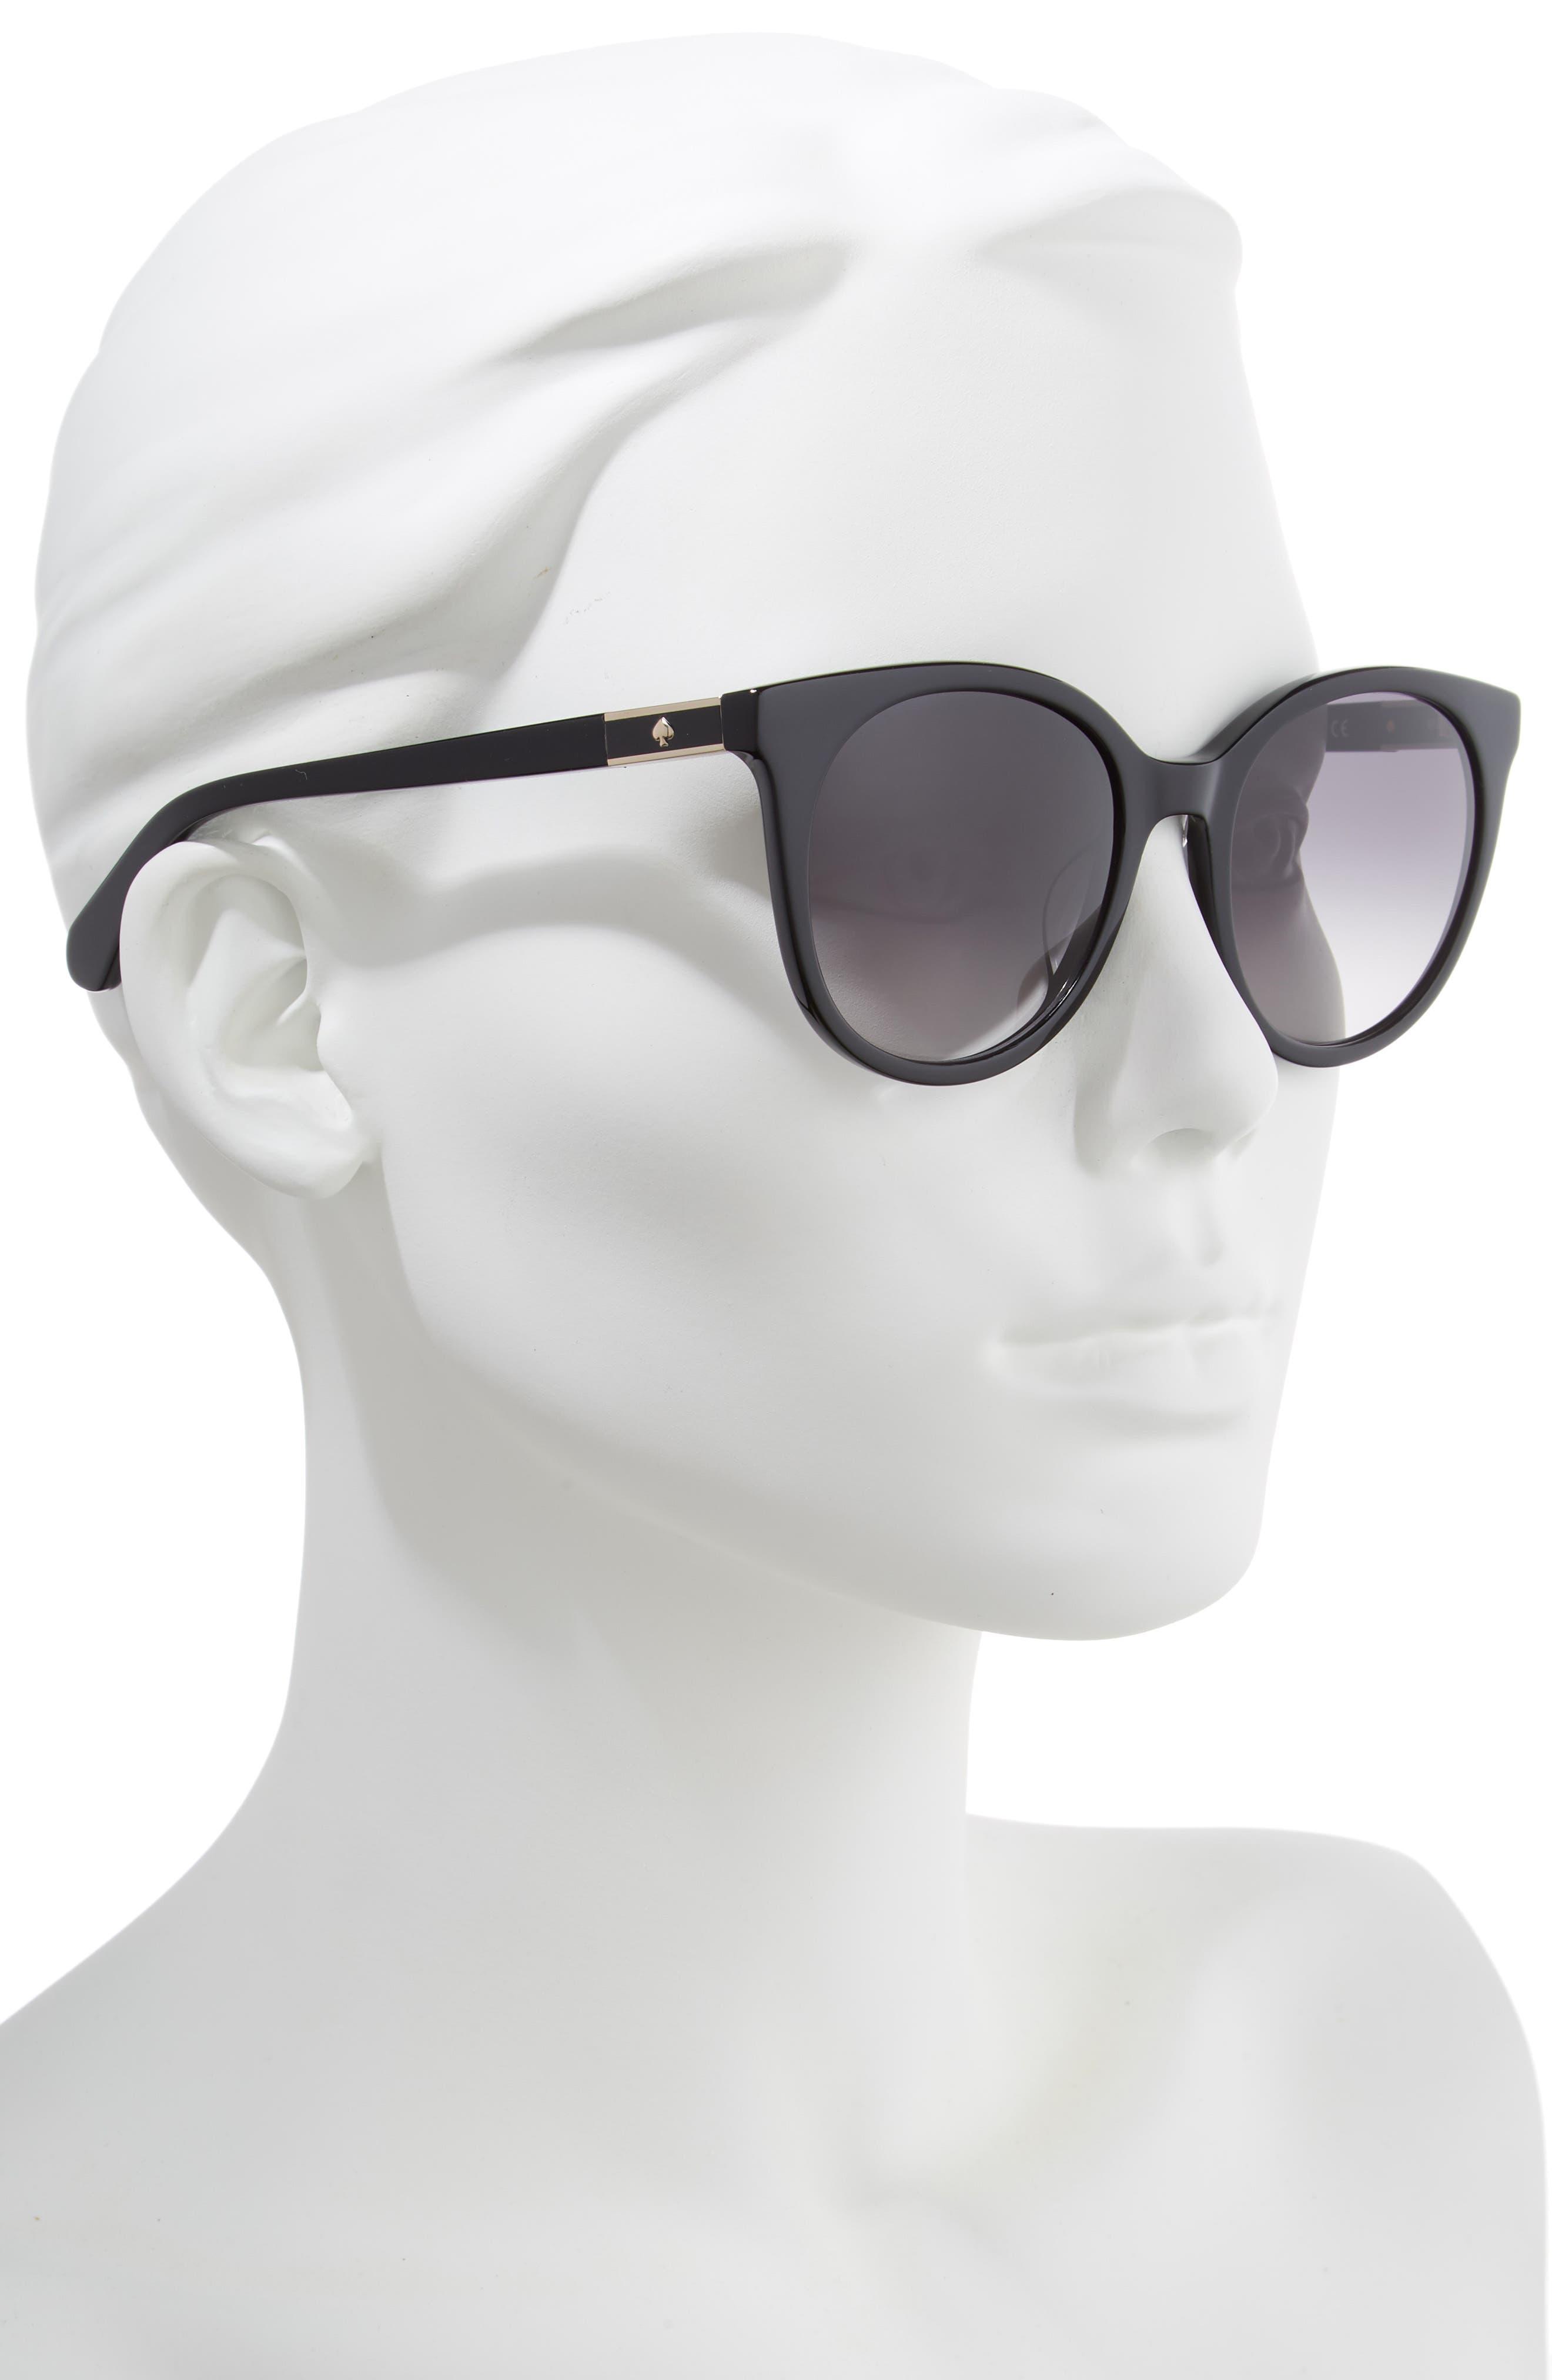 akayla 52mm cat eye sunglasses,                             Alternate thumbnail 2, color,                             BLACK